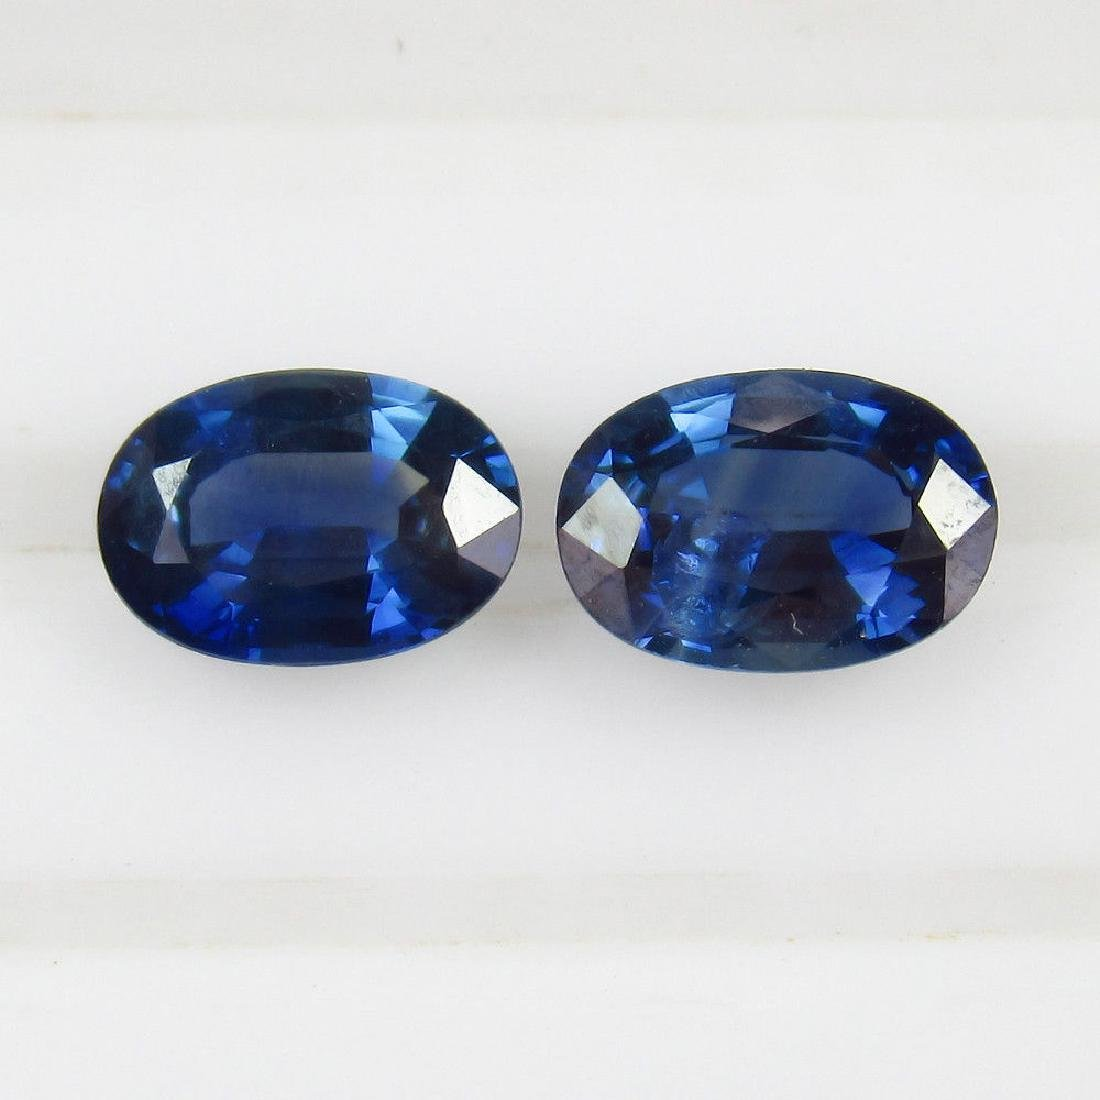 2.00 Ct Genuine Ceylon Deep Vivid Blue Sapphire